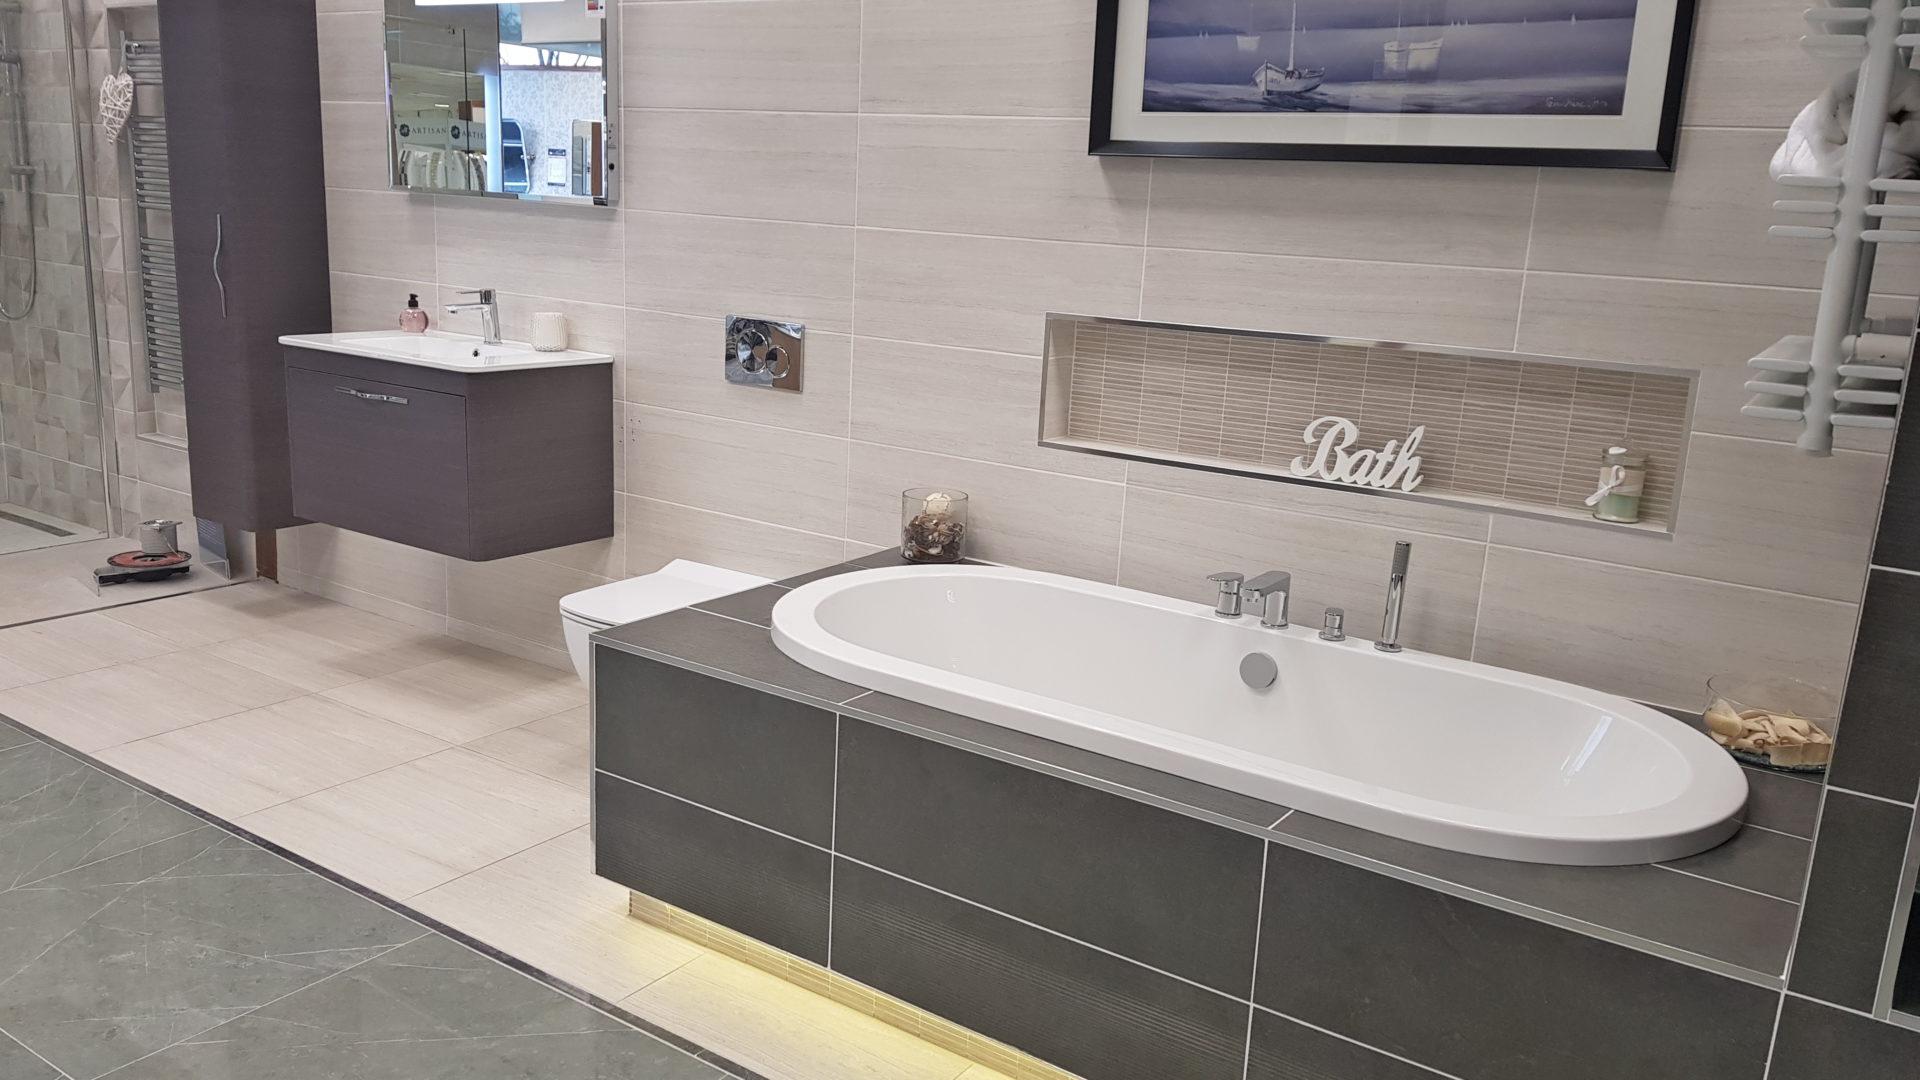 Dublin City Tiles & Bathrooms